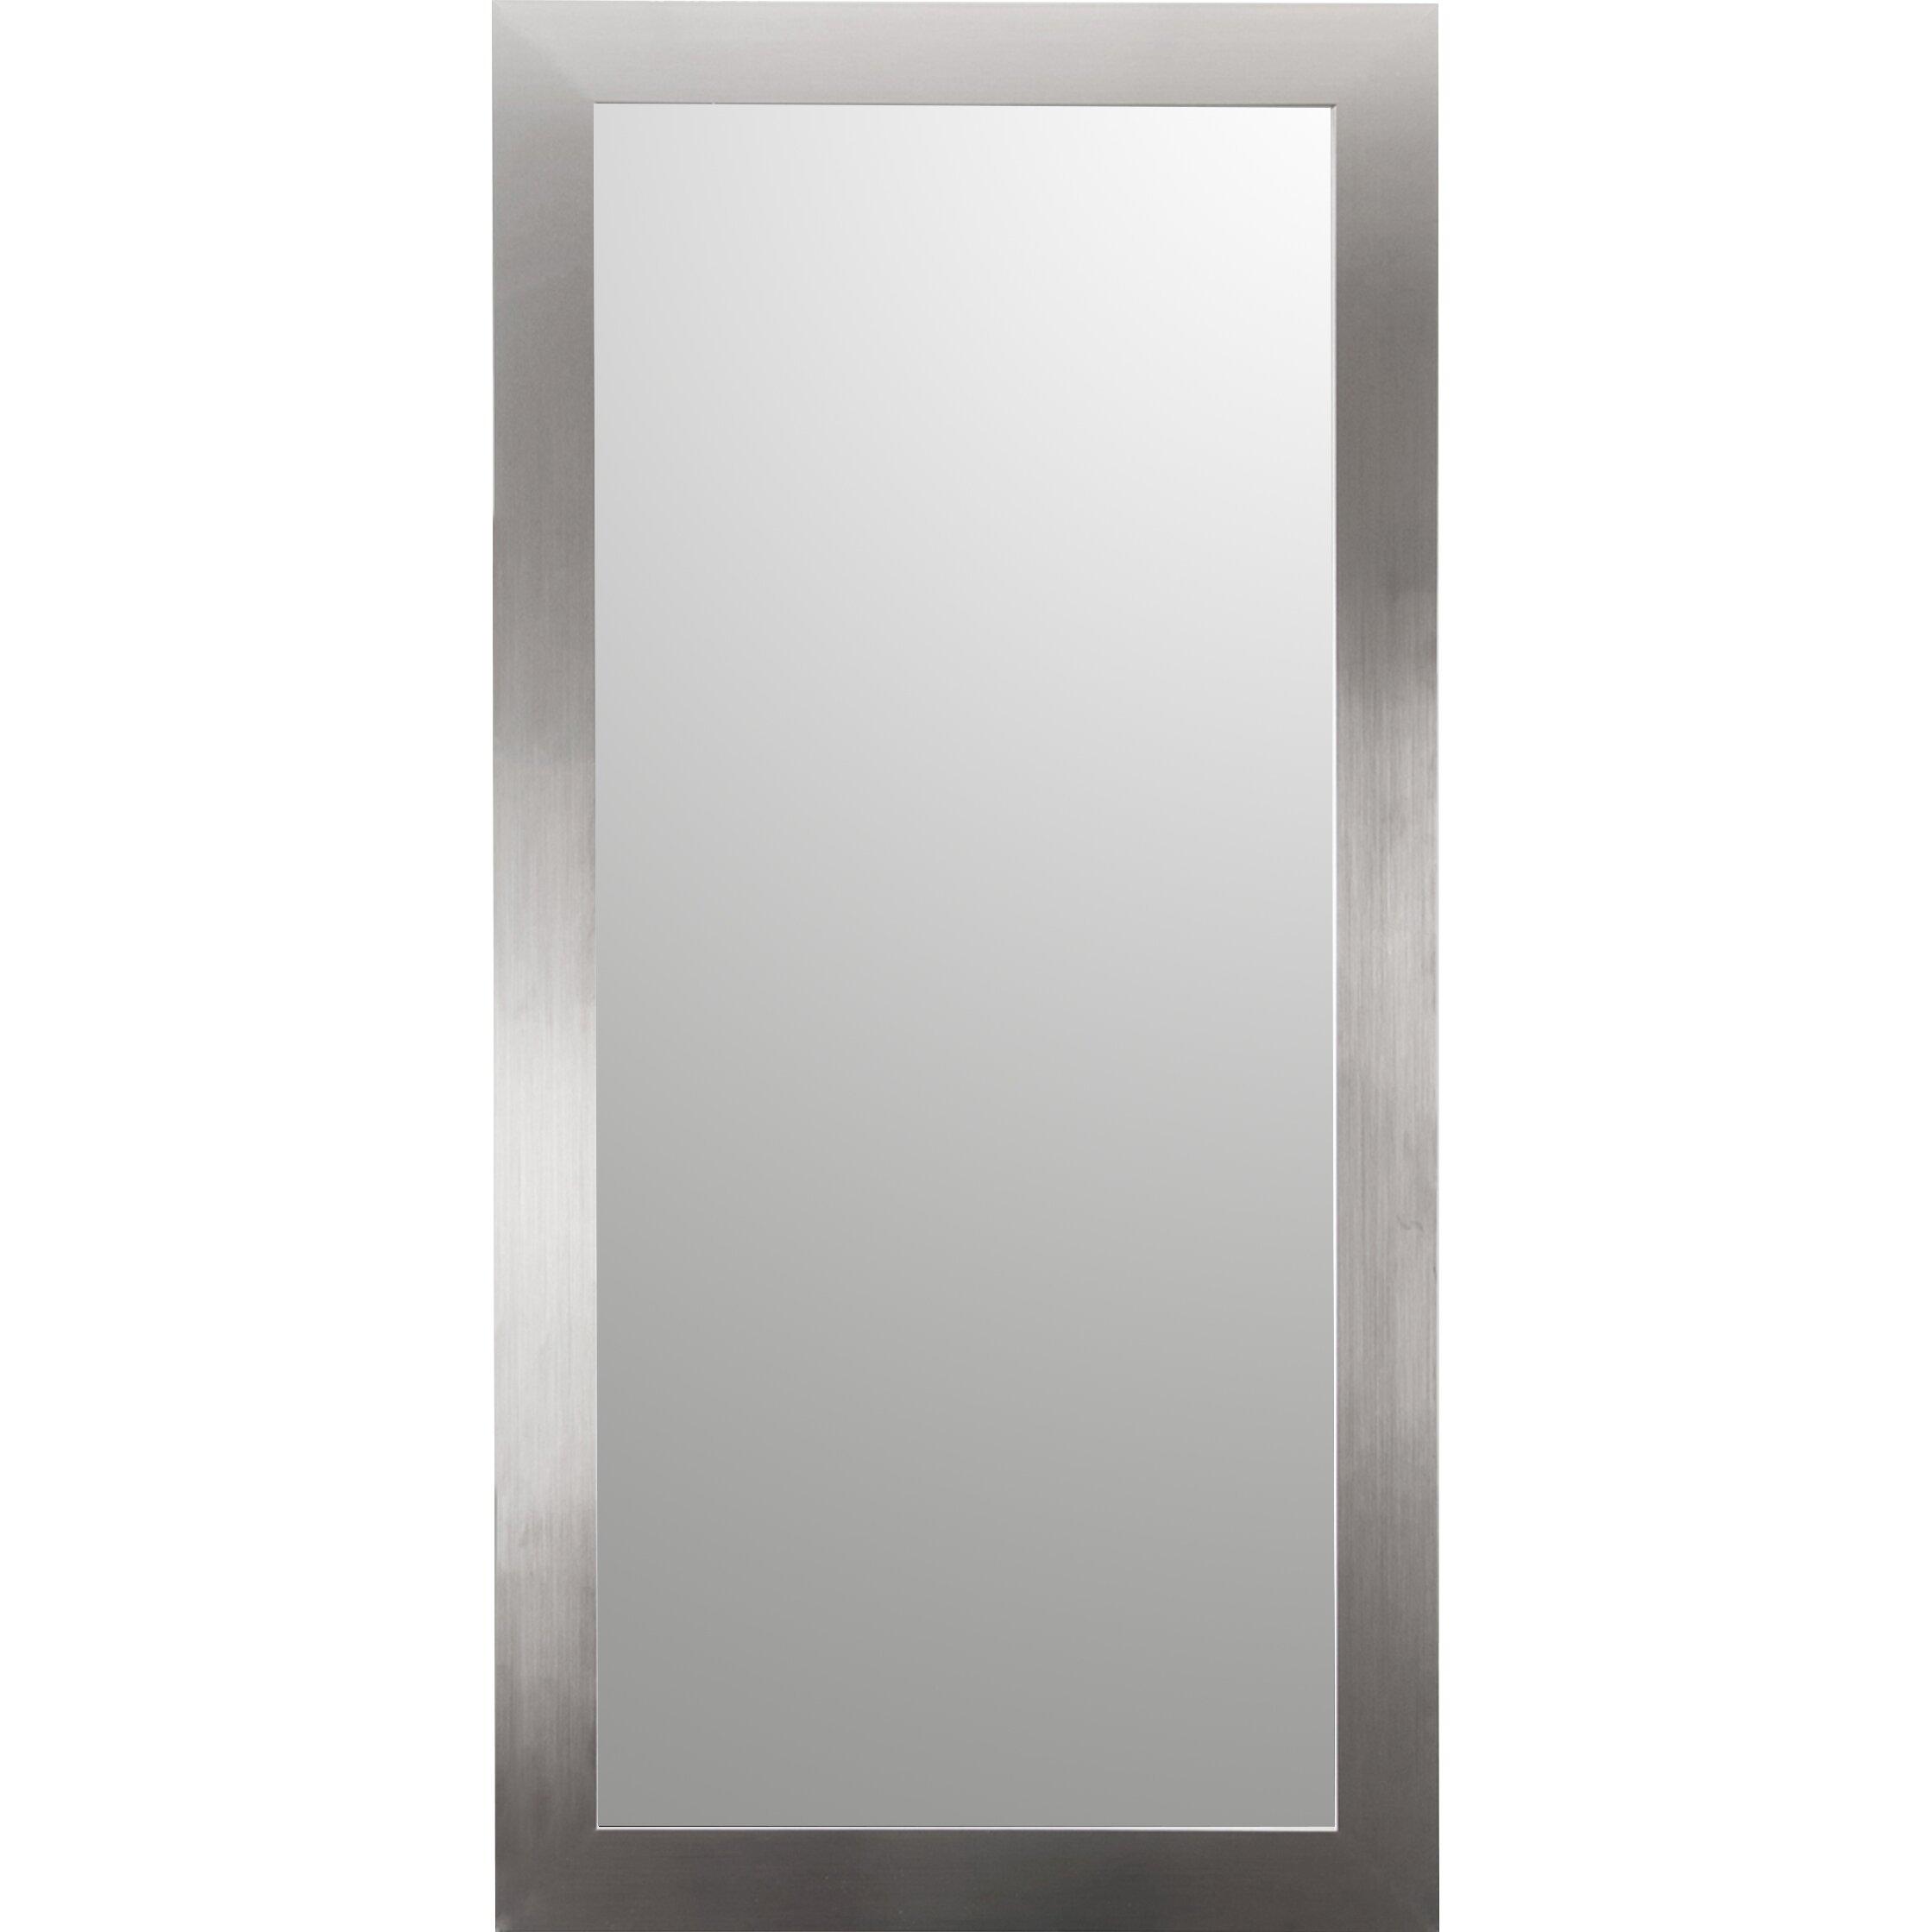 Brandtworksllc full body floor mirror reviews wayfair for Glass floor mirror